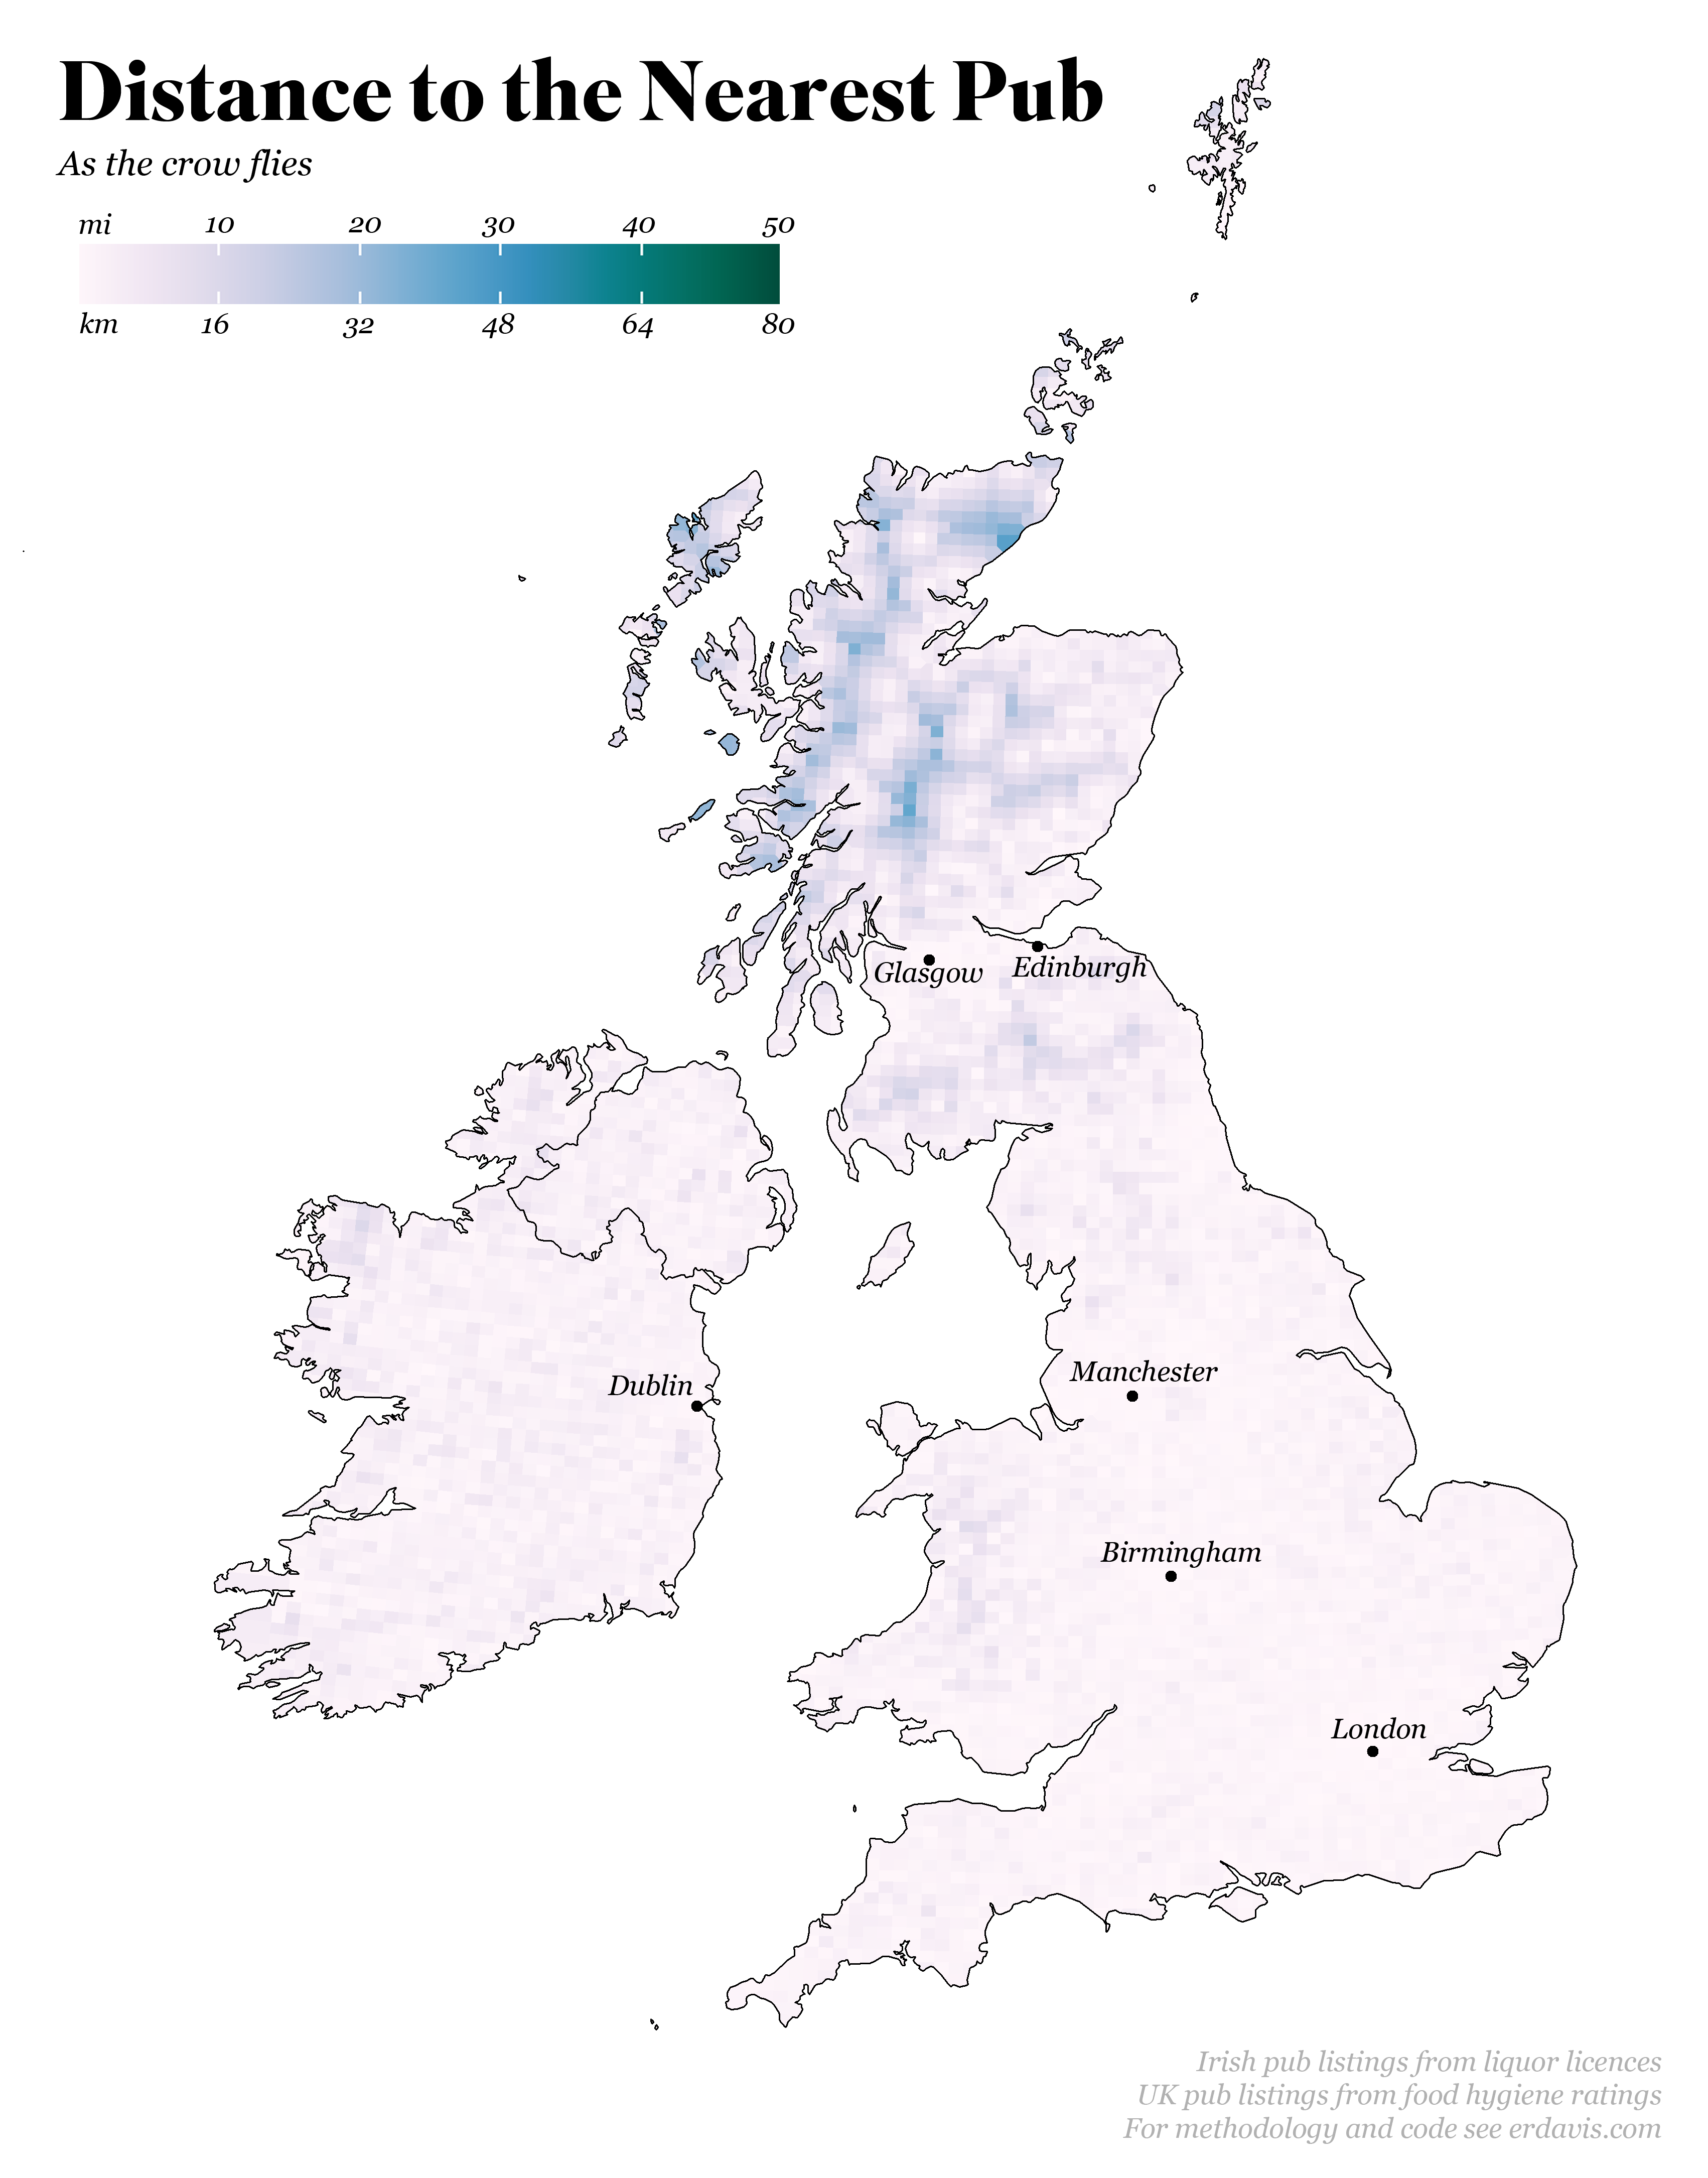 Distance to the Nearest Pub – Data Stuff